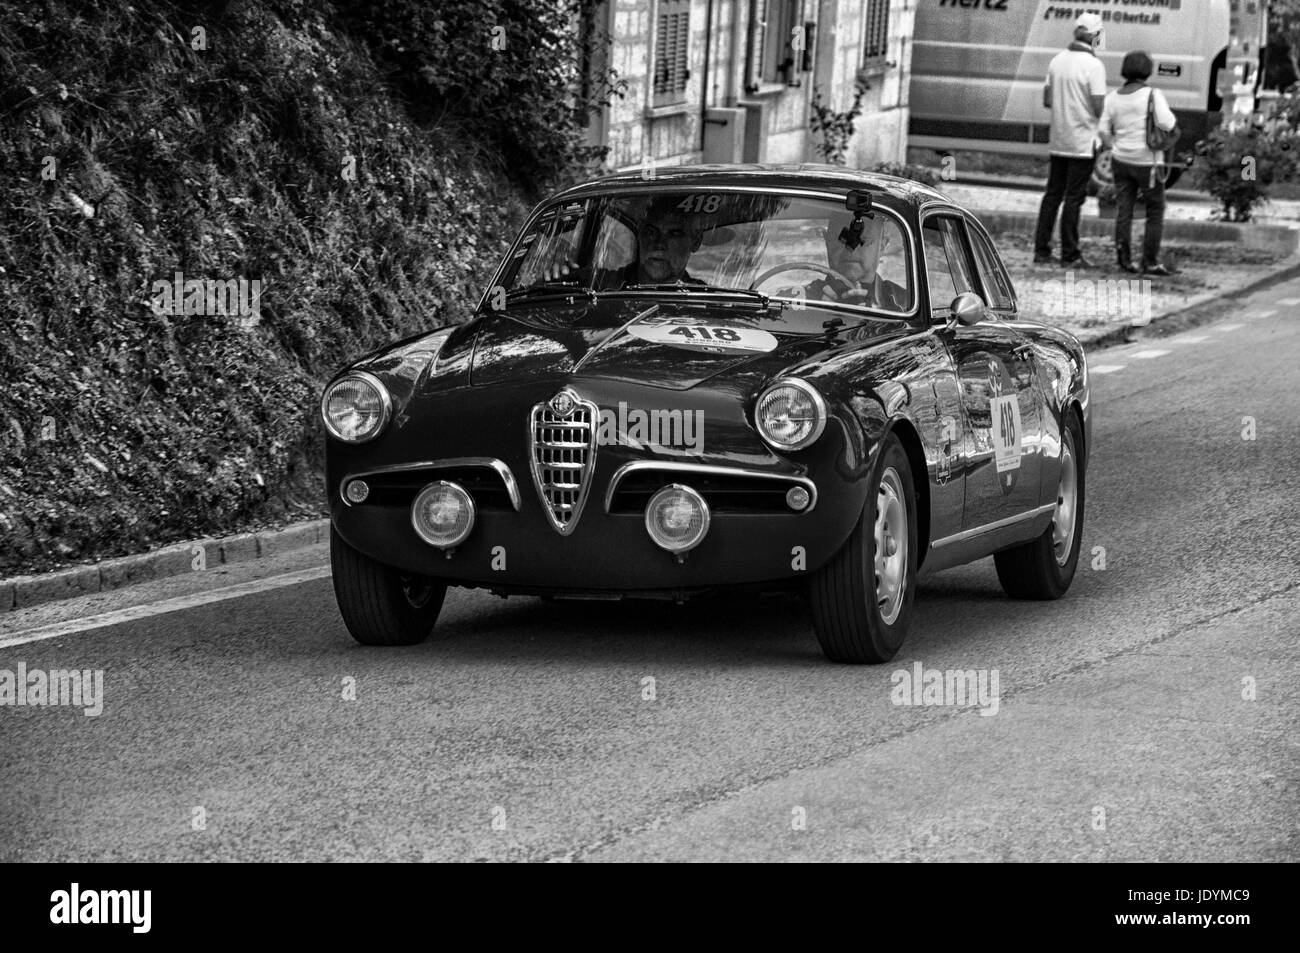 ALFA ROMEO GIULIETTA SPRINT VELOCE 1956 on an old racing car in ...